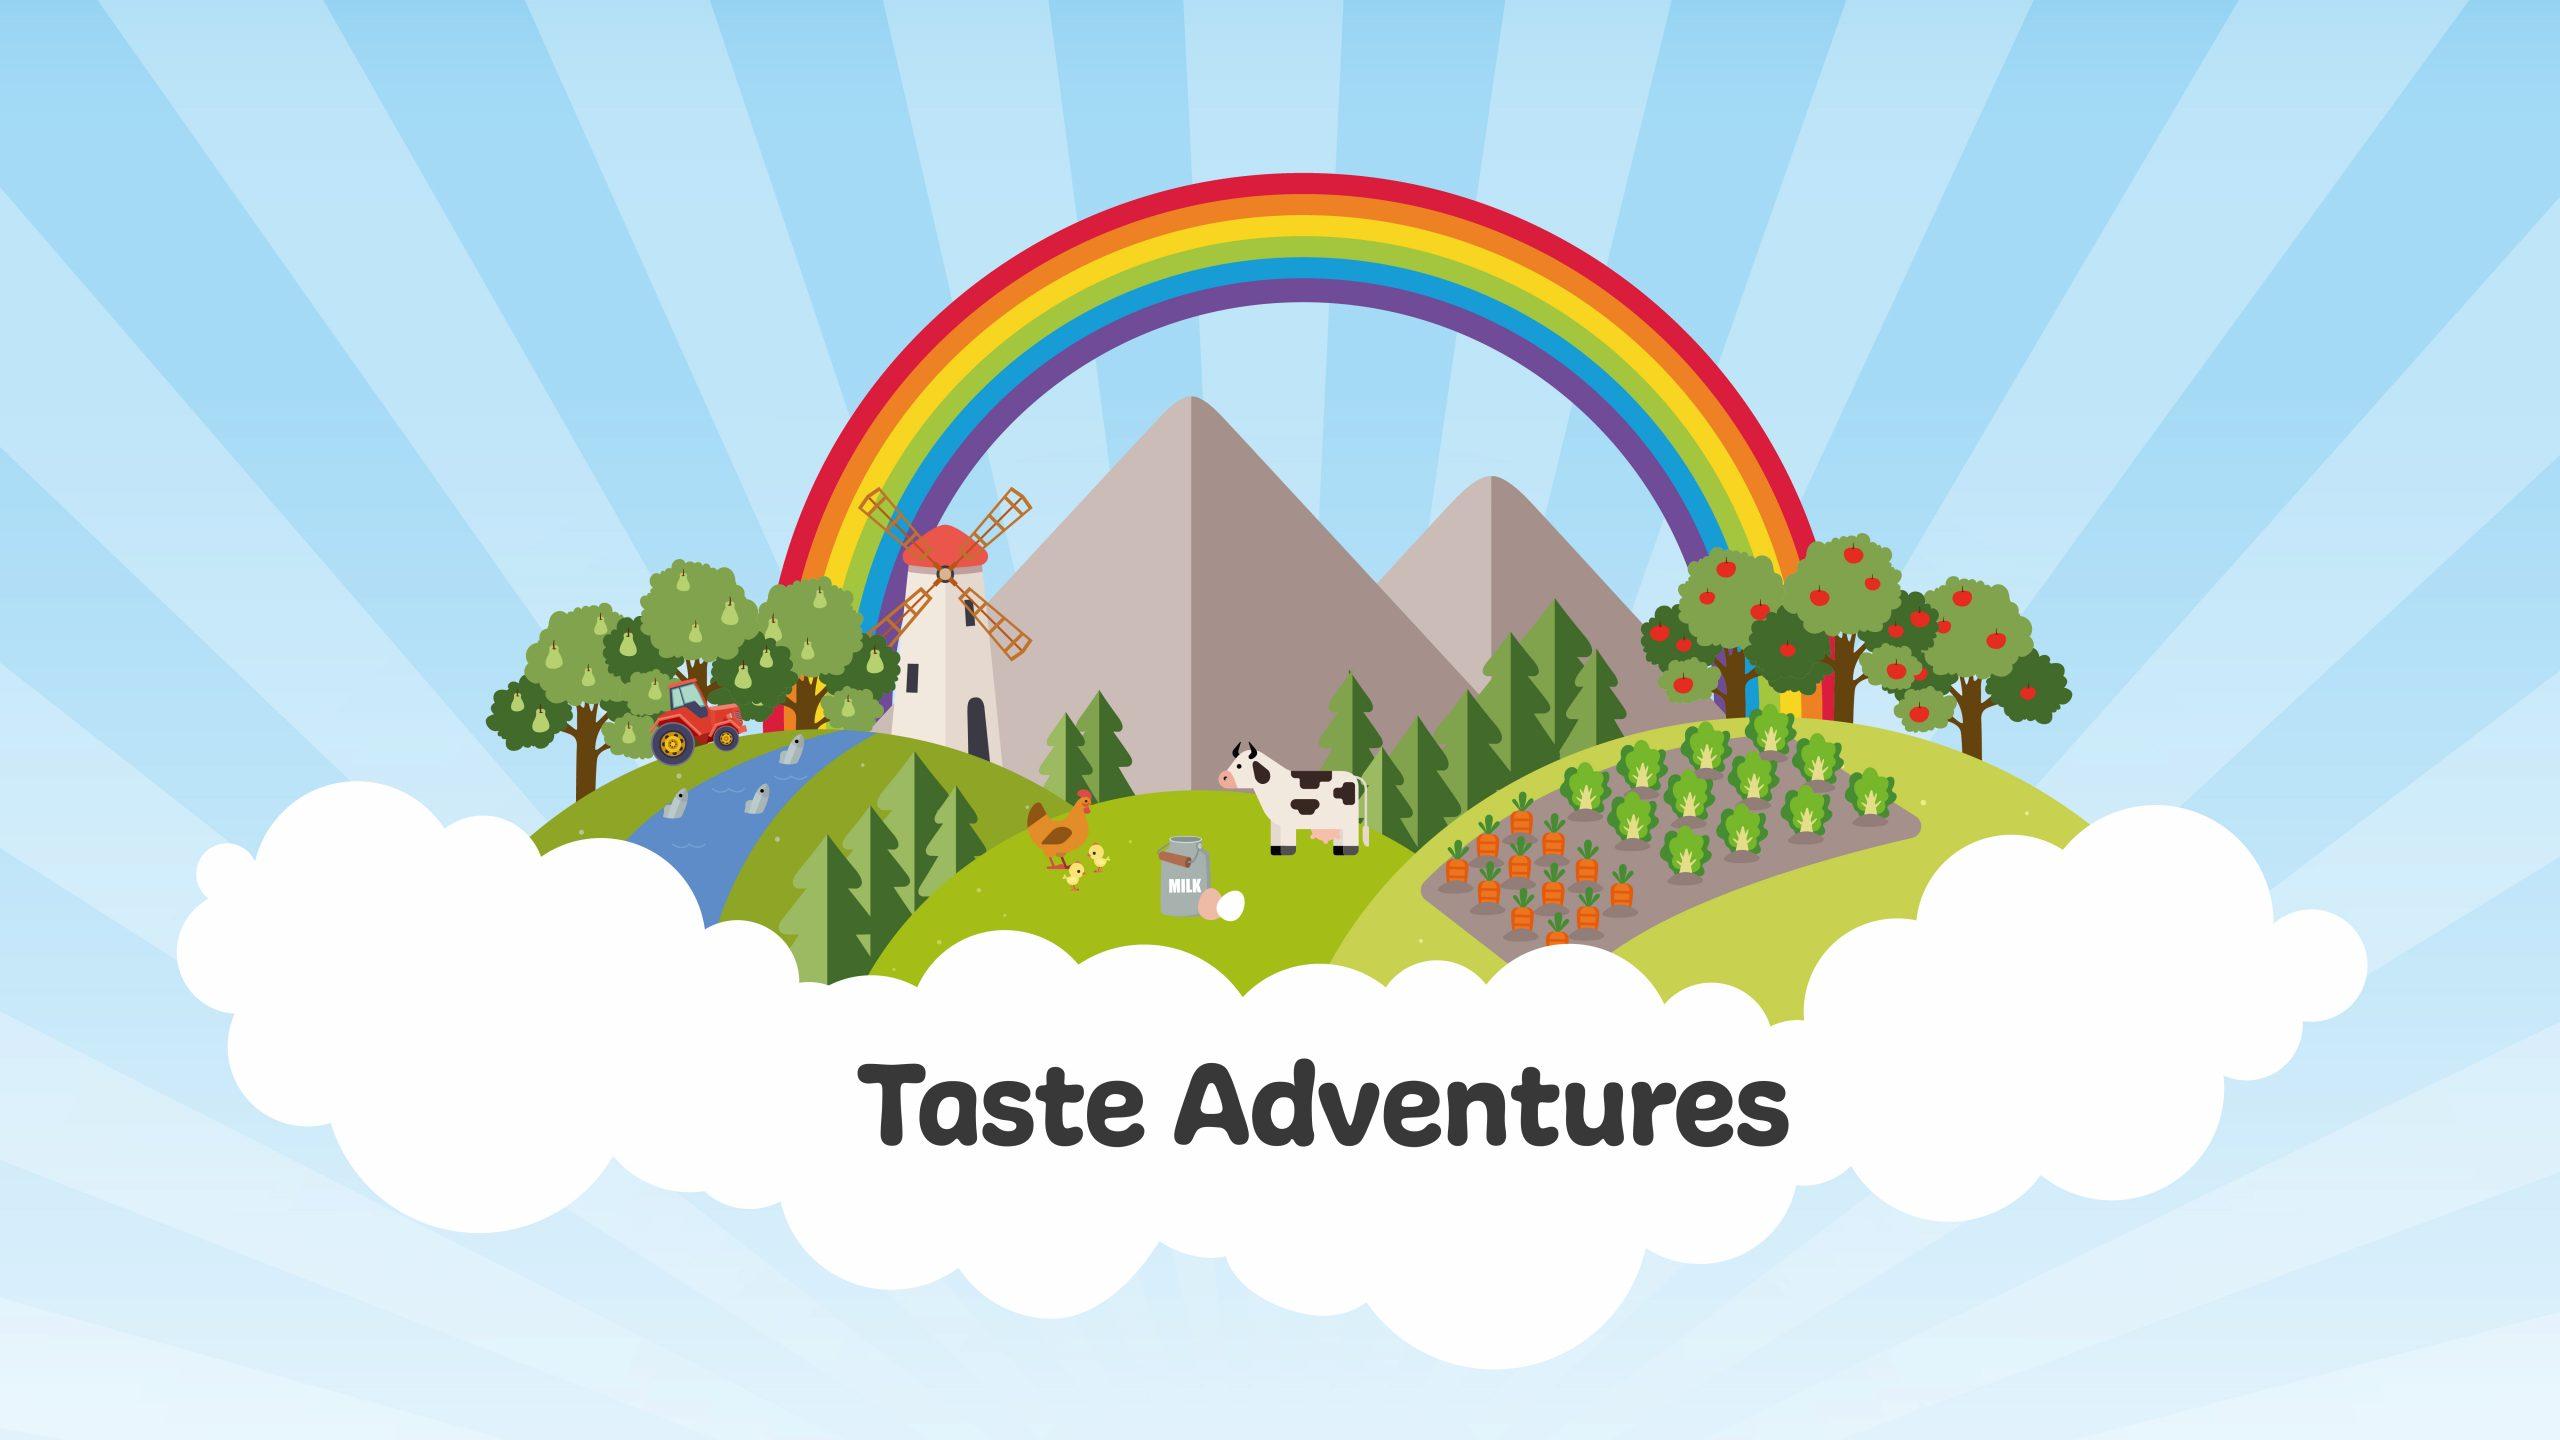 Tasteadventuressceneblueskyburstwithgradient-01